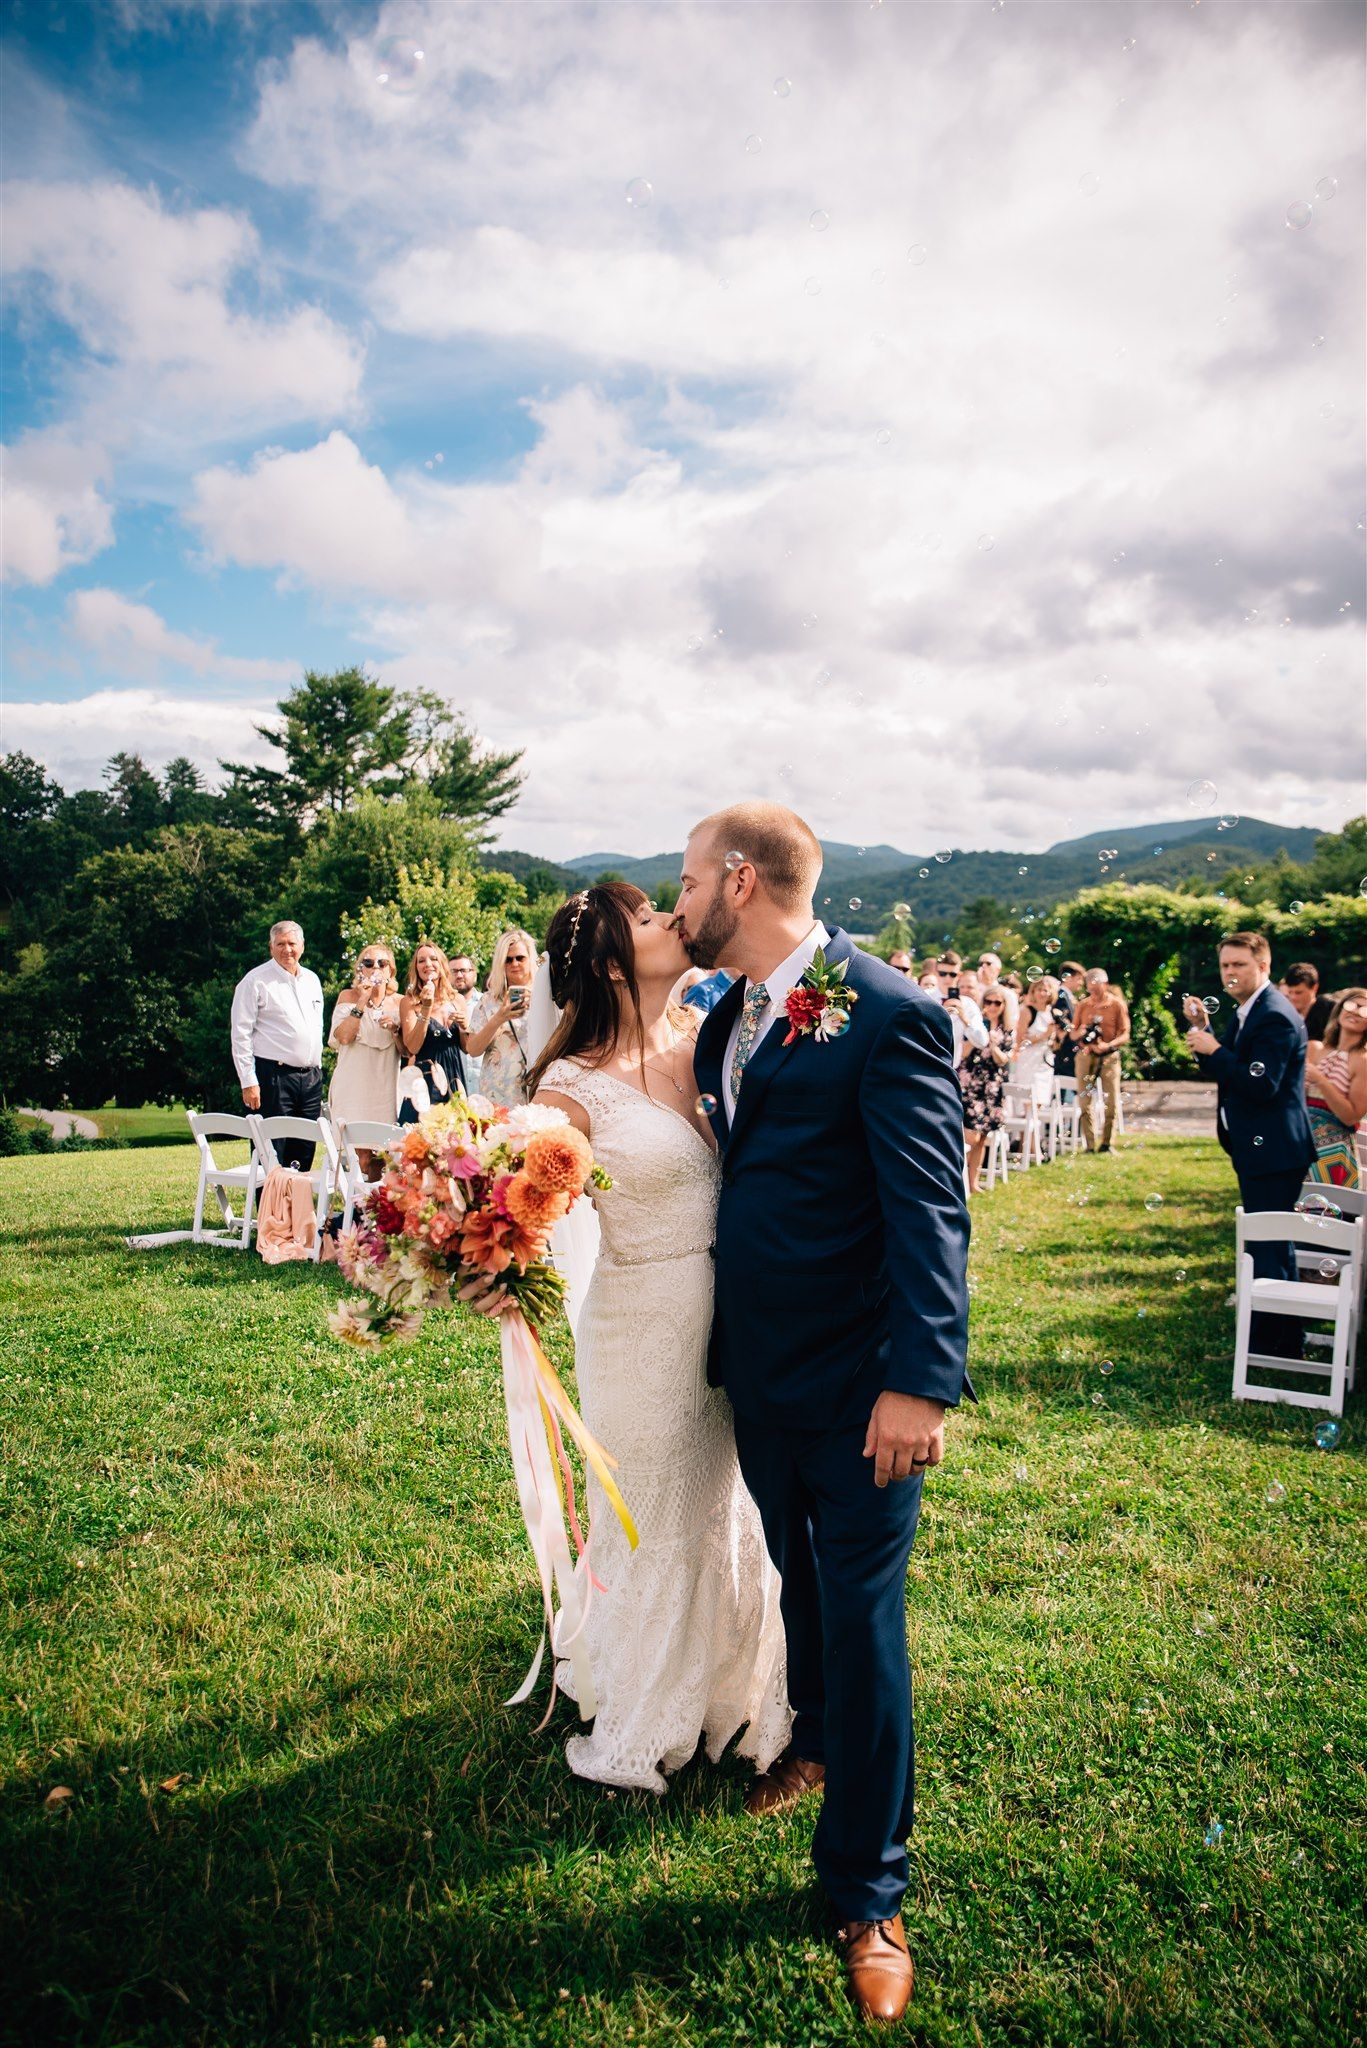 North Carolina Wedding PhotograpySawyer Family Farmstead